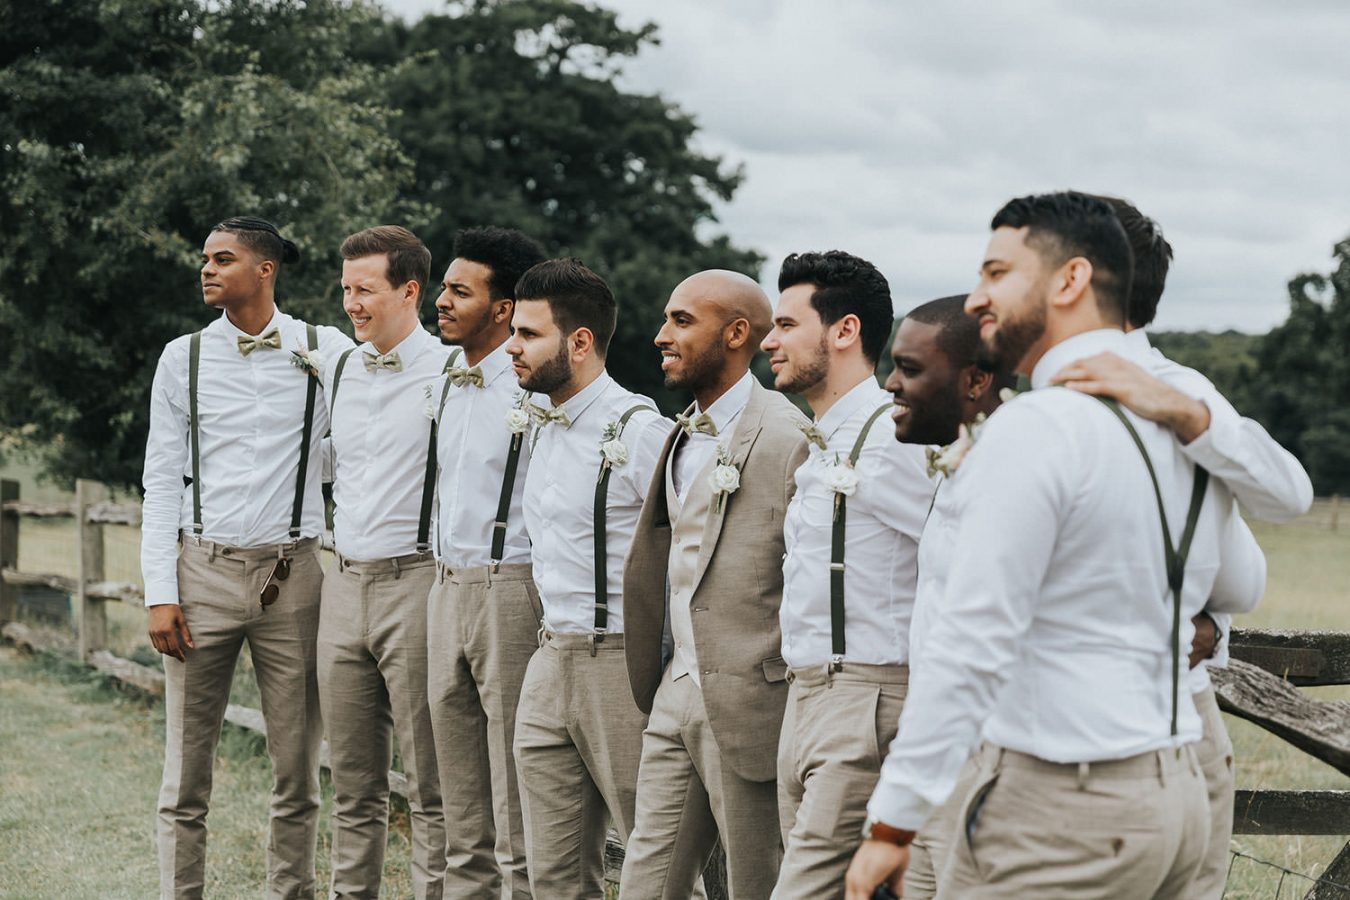 gaynes-park-wedding-essex035